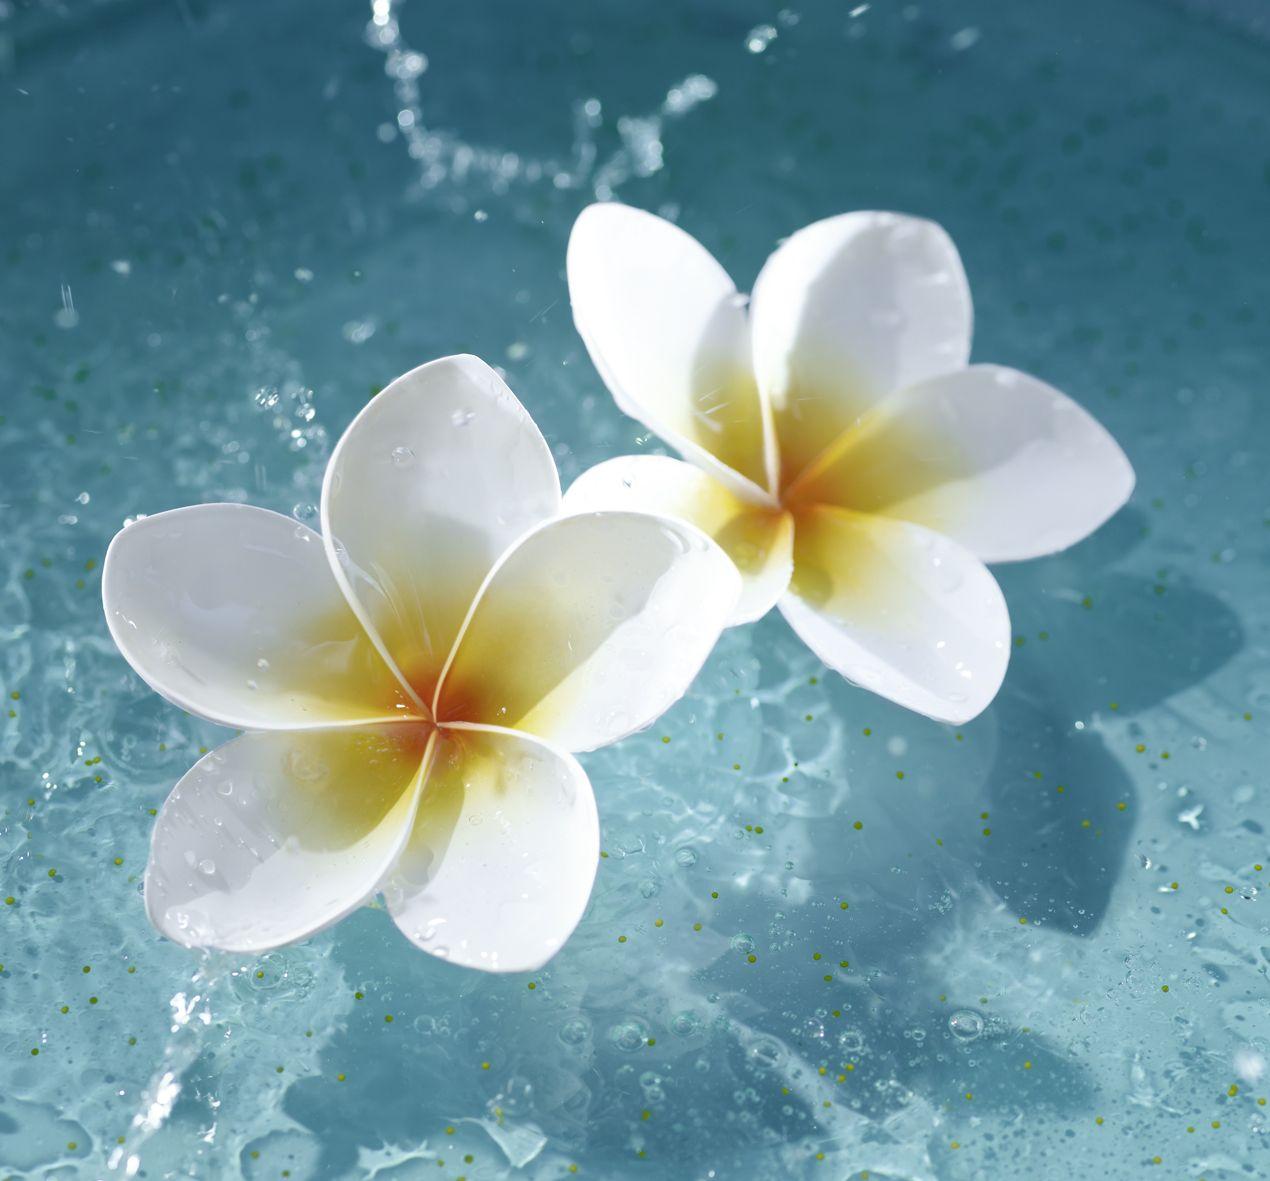 Pin By Sarah Woods On Beauty Allrounder Diy Rezepte Hawaii Flowers Plumeria Flowers Flowers